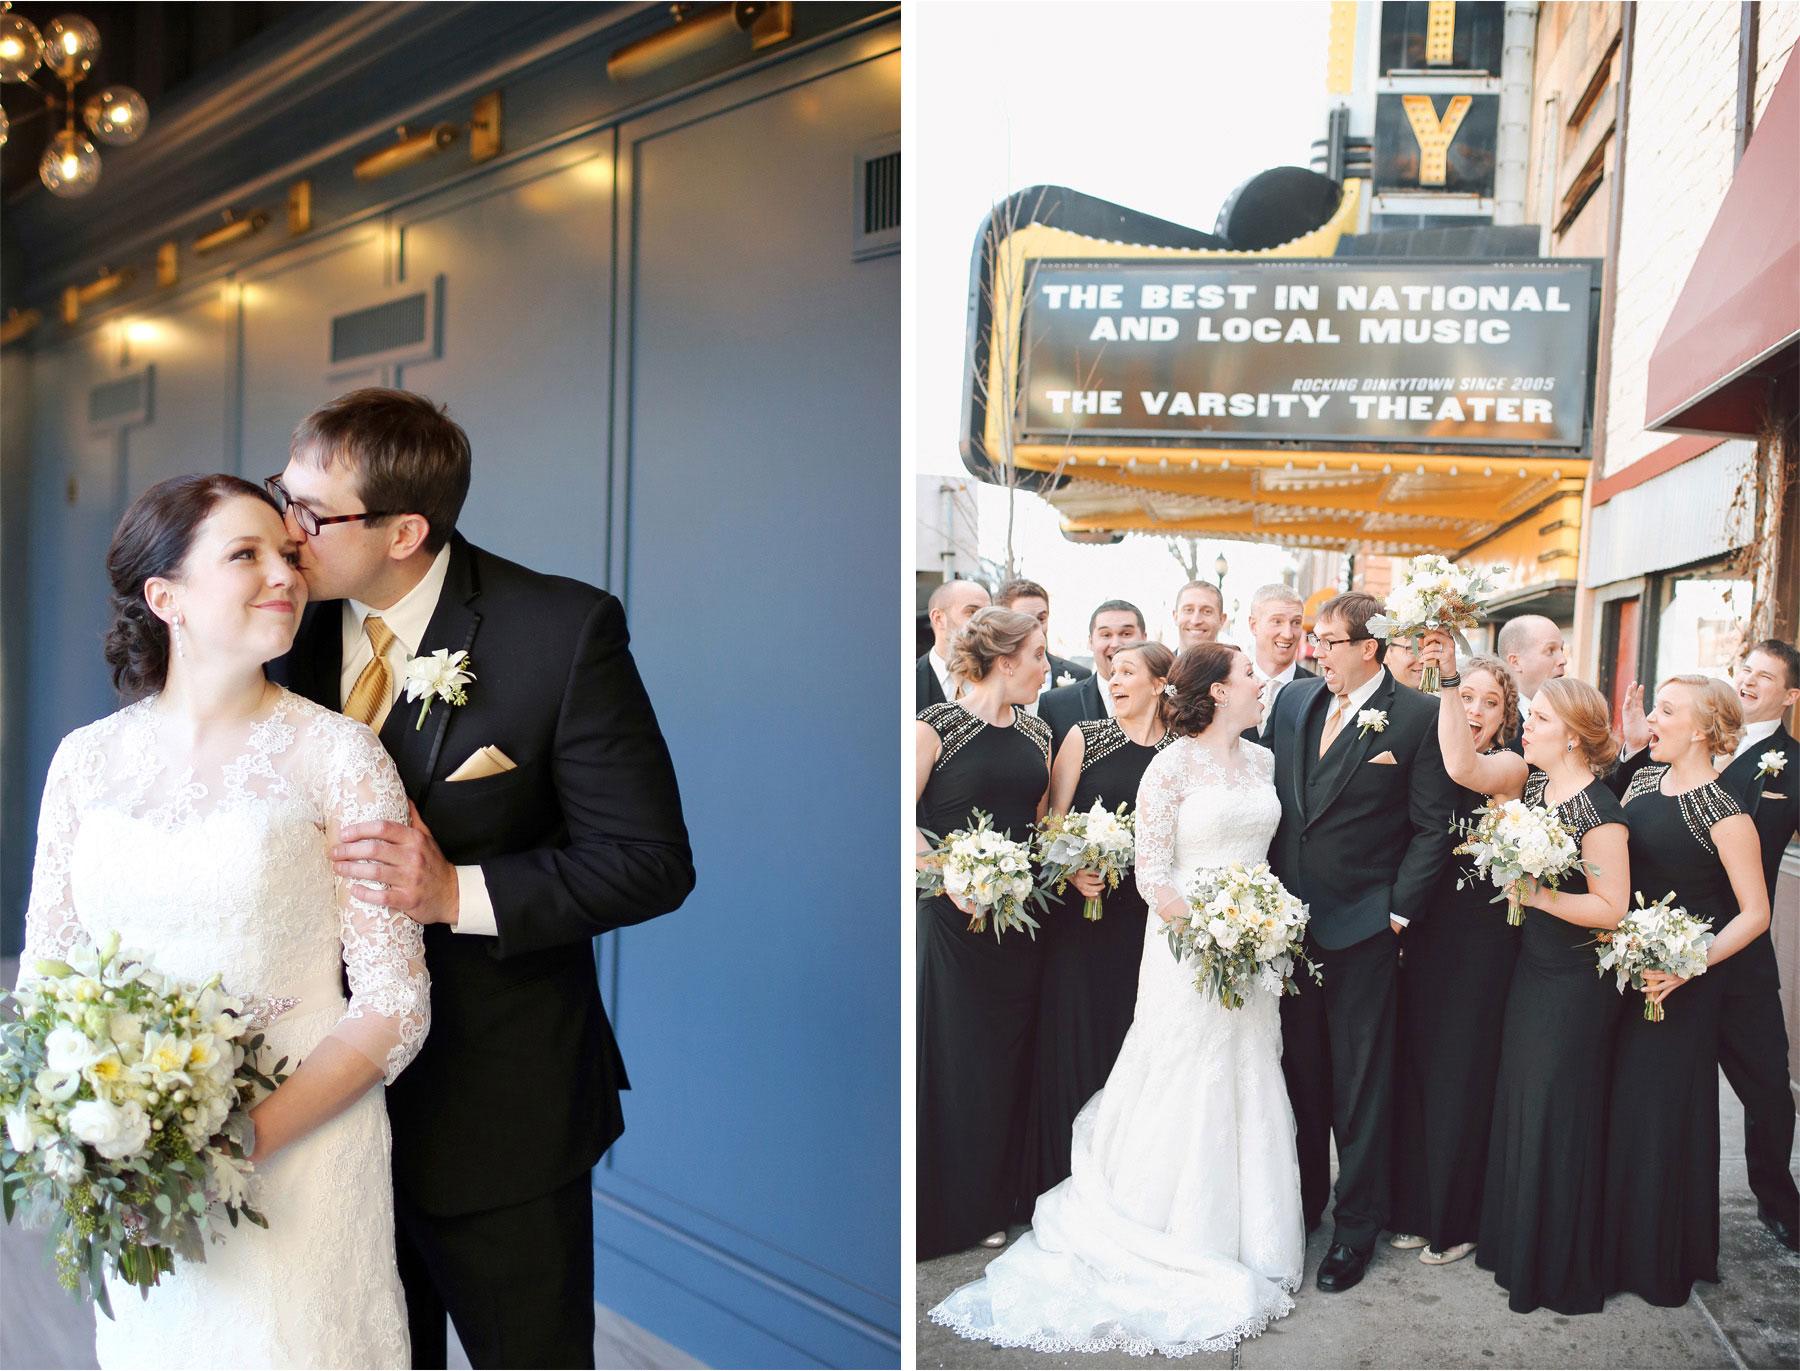 07-Minneapolis-Minnesota-Wedding-Photographer-by-Andrew-Vick-Photography-Winter-Renaissance-Hotel-First-Meeting-Look-Bride-Groom-Flowers-Varsity-Theater-Bridal-Party-Groomsmen-Bridesmaids-Sara-and-Rob.jpg